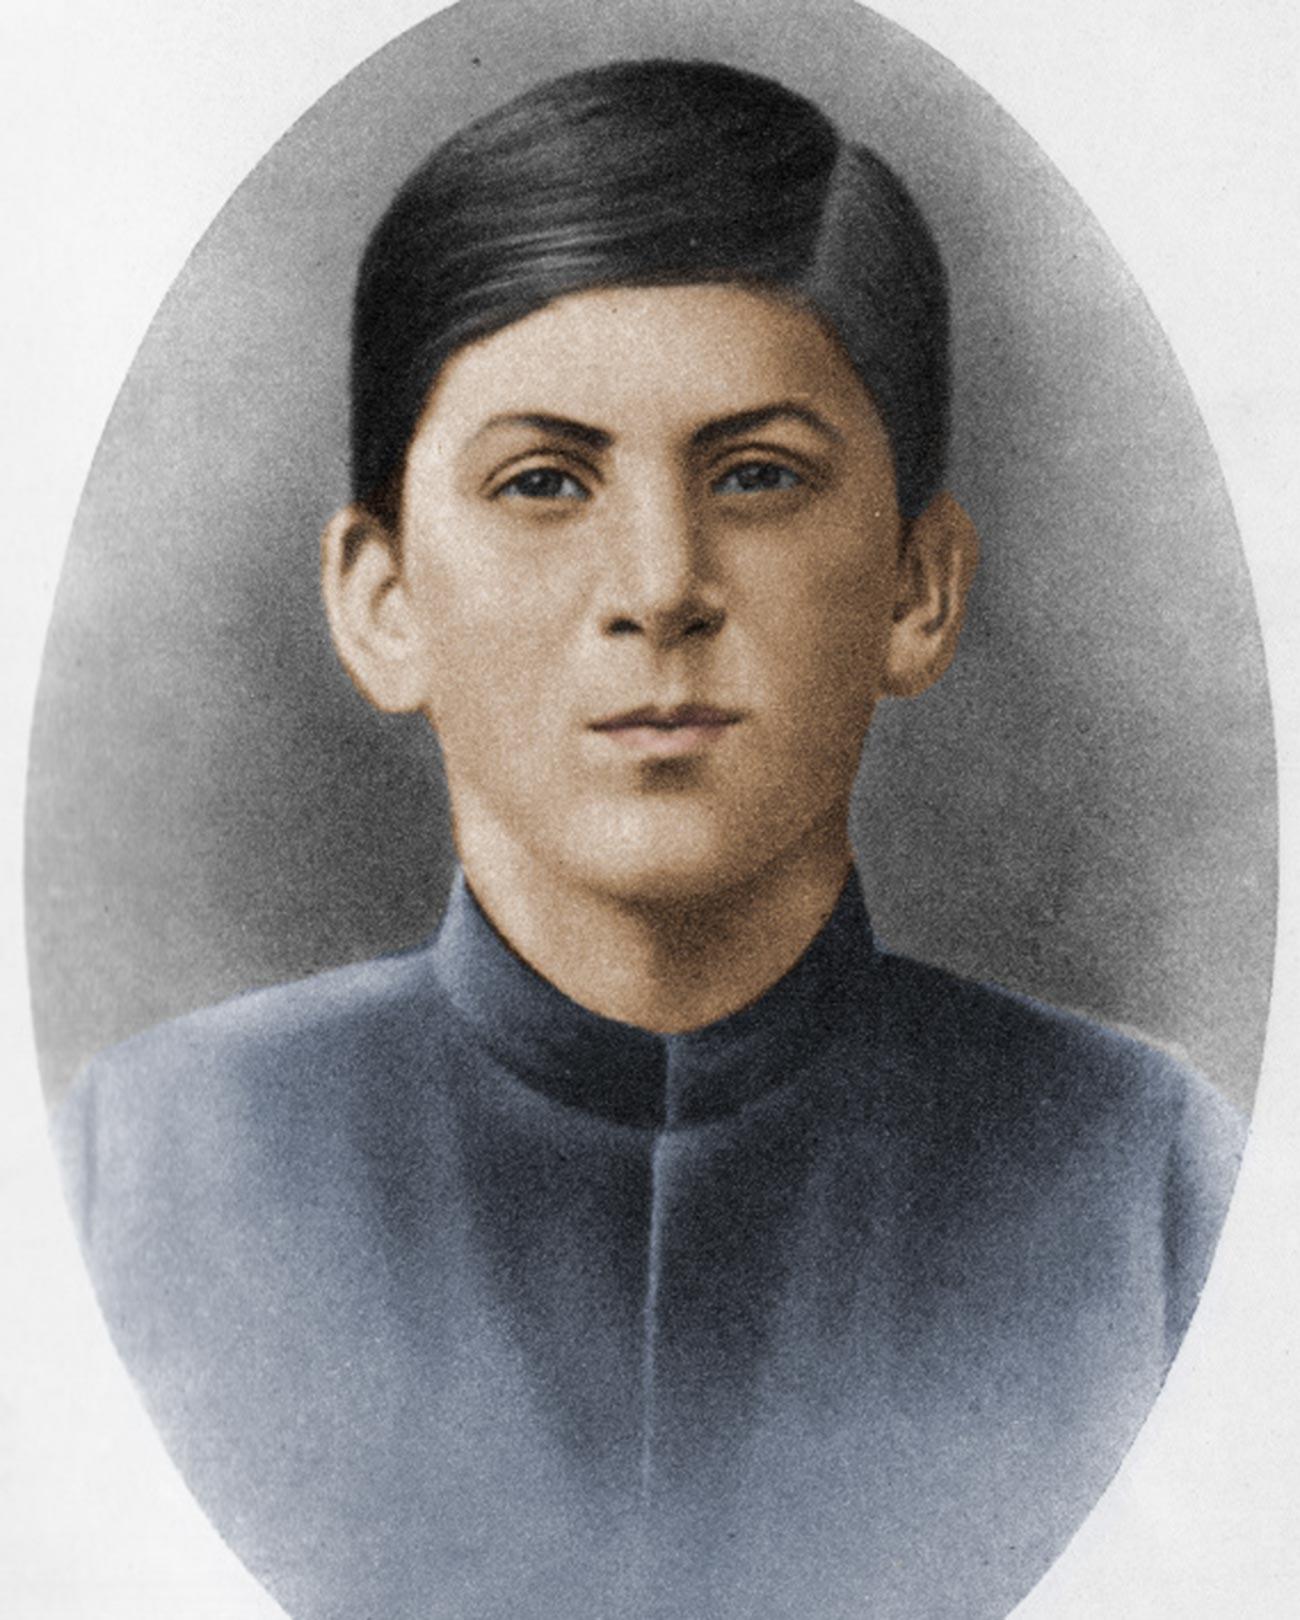 Staline en 1894